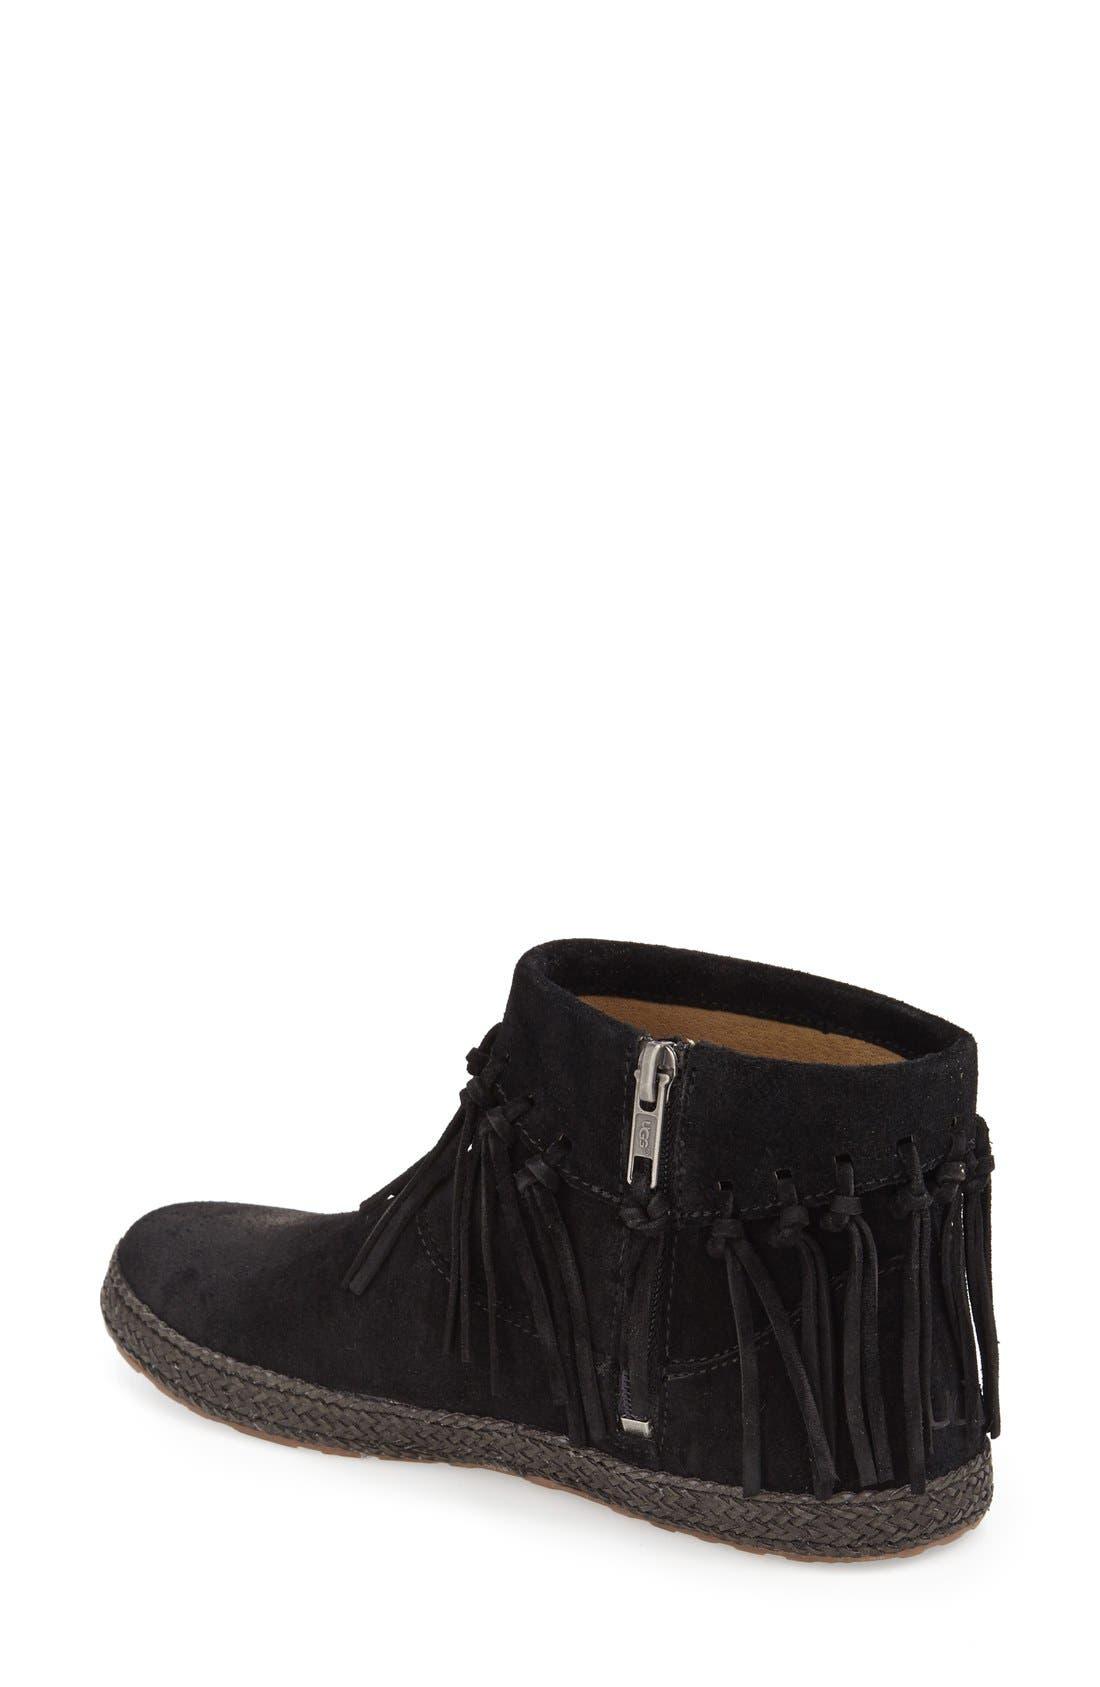 Alternate Image 2  - UGG® 'Shenendoah' Fringe Ankle Boot (Women)